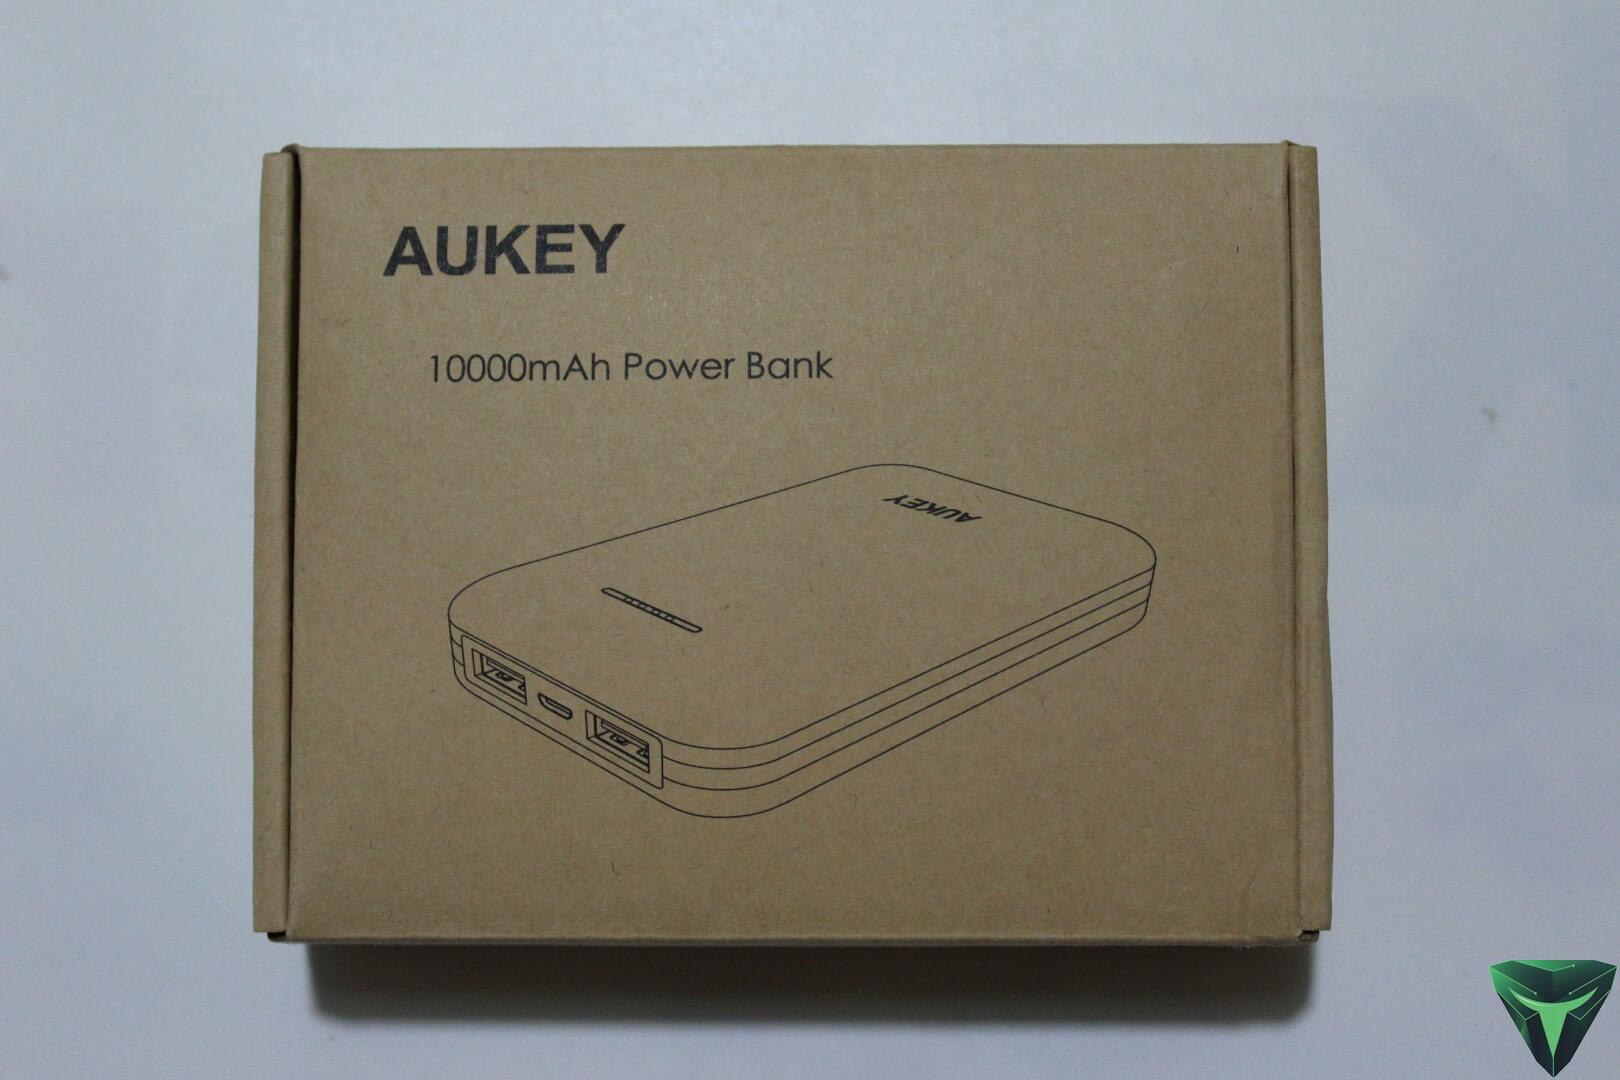 Aukey PB-N53 powerbank recensione